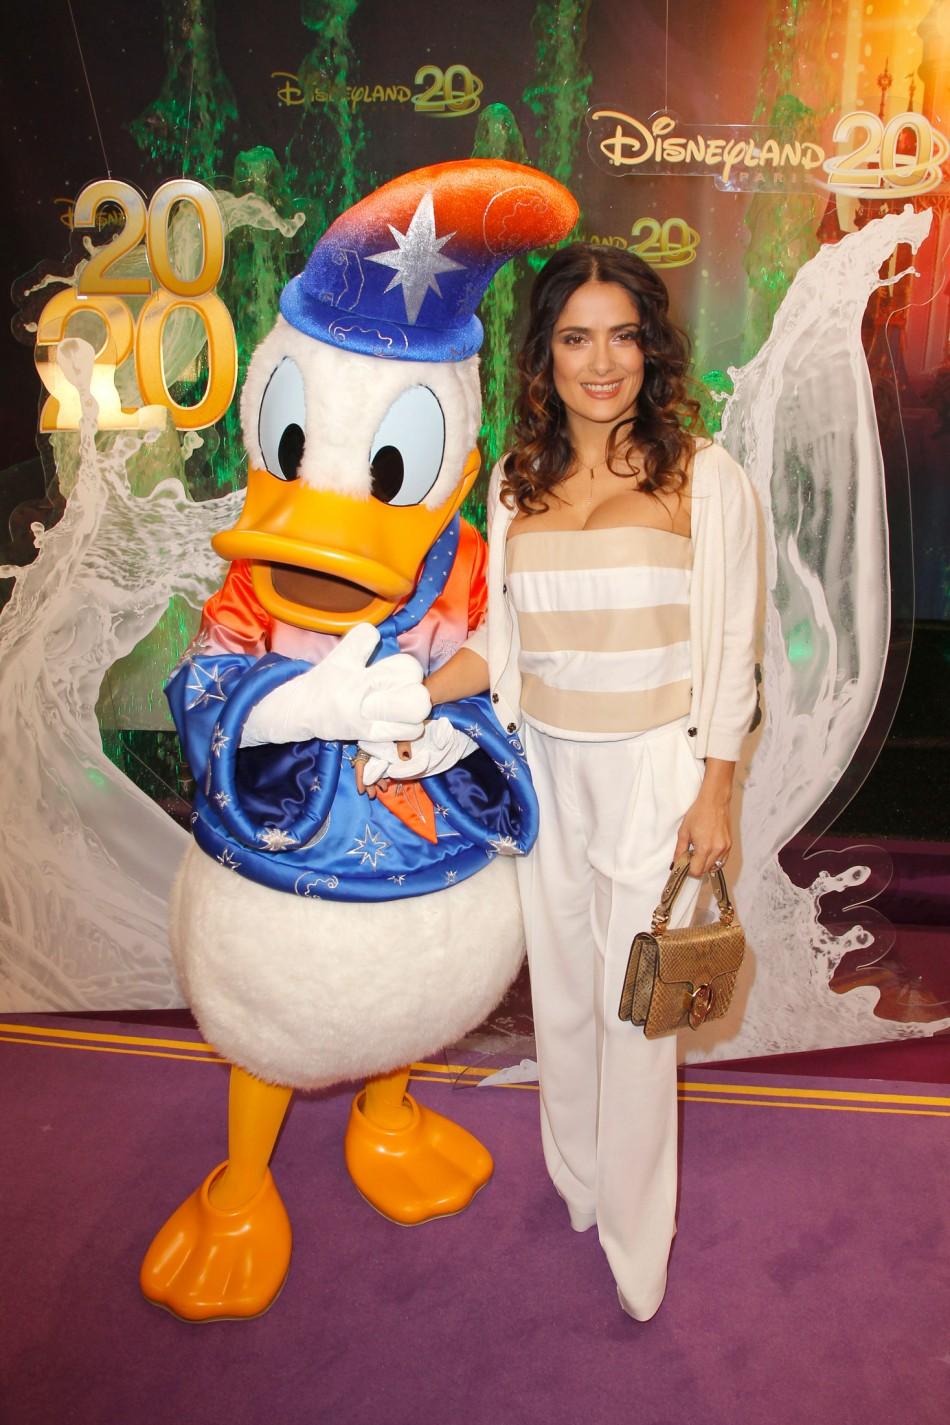 From Salma Hayek to Katie Melua Celebs at 20th Paris Disneyland Resort Anniversary Celebrations